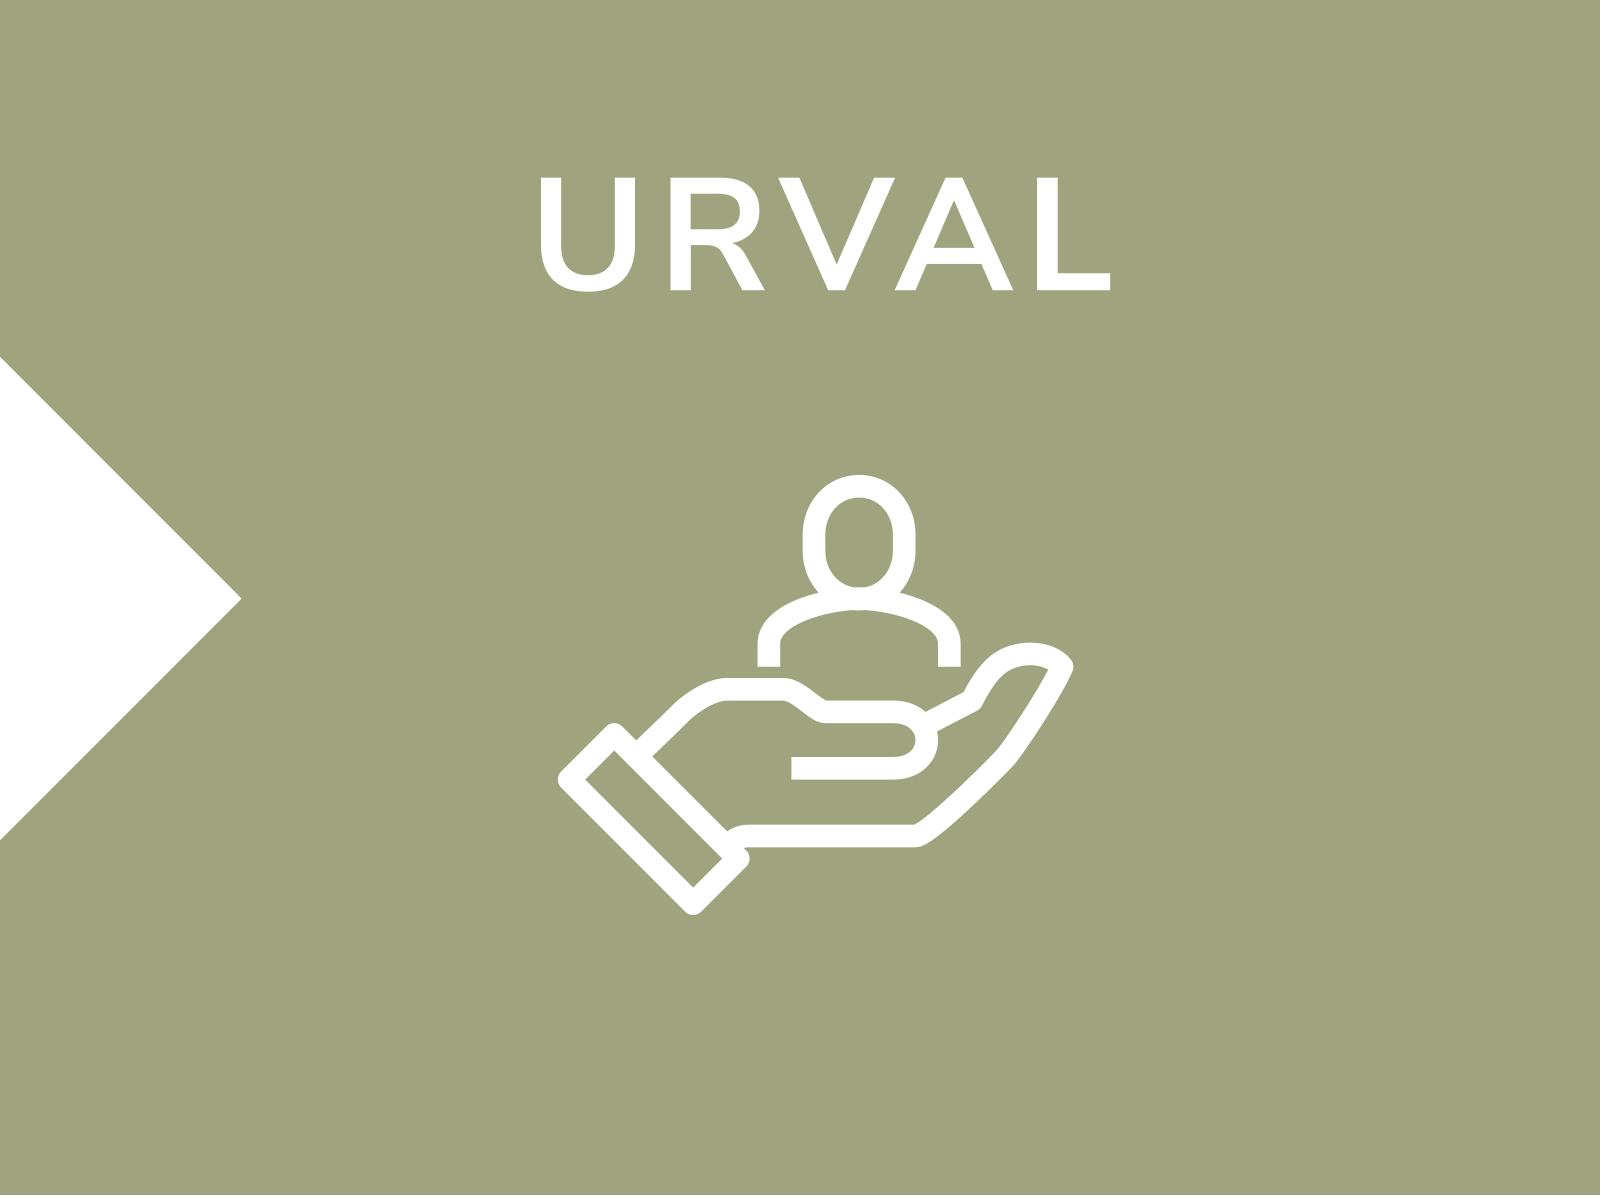 Process-urval